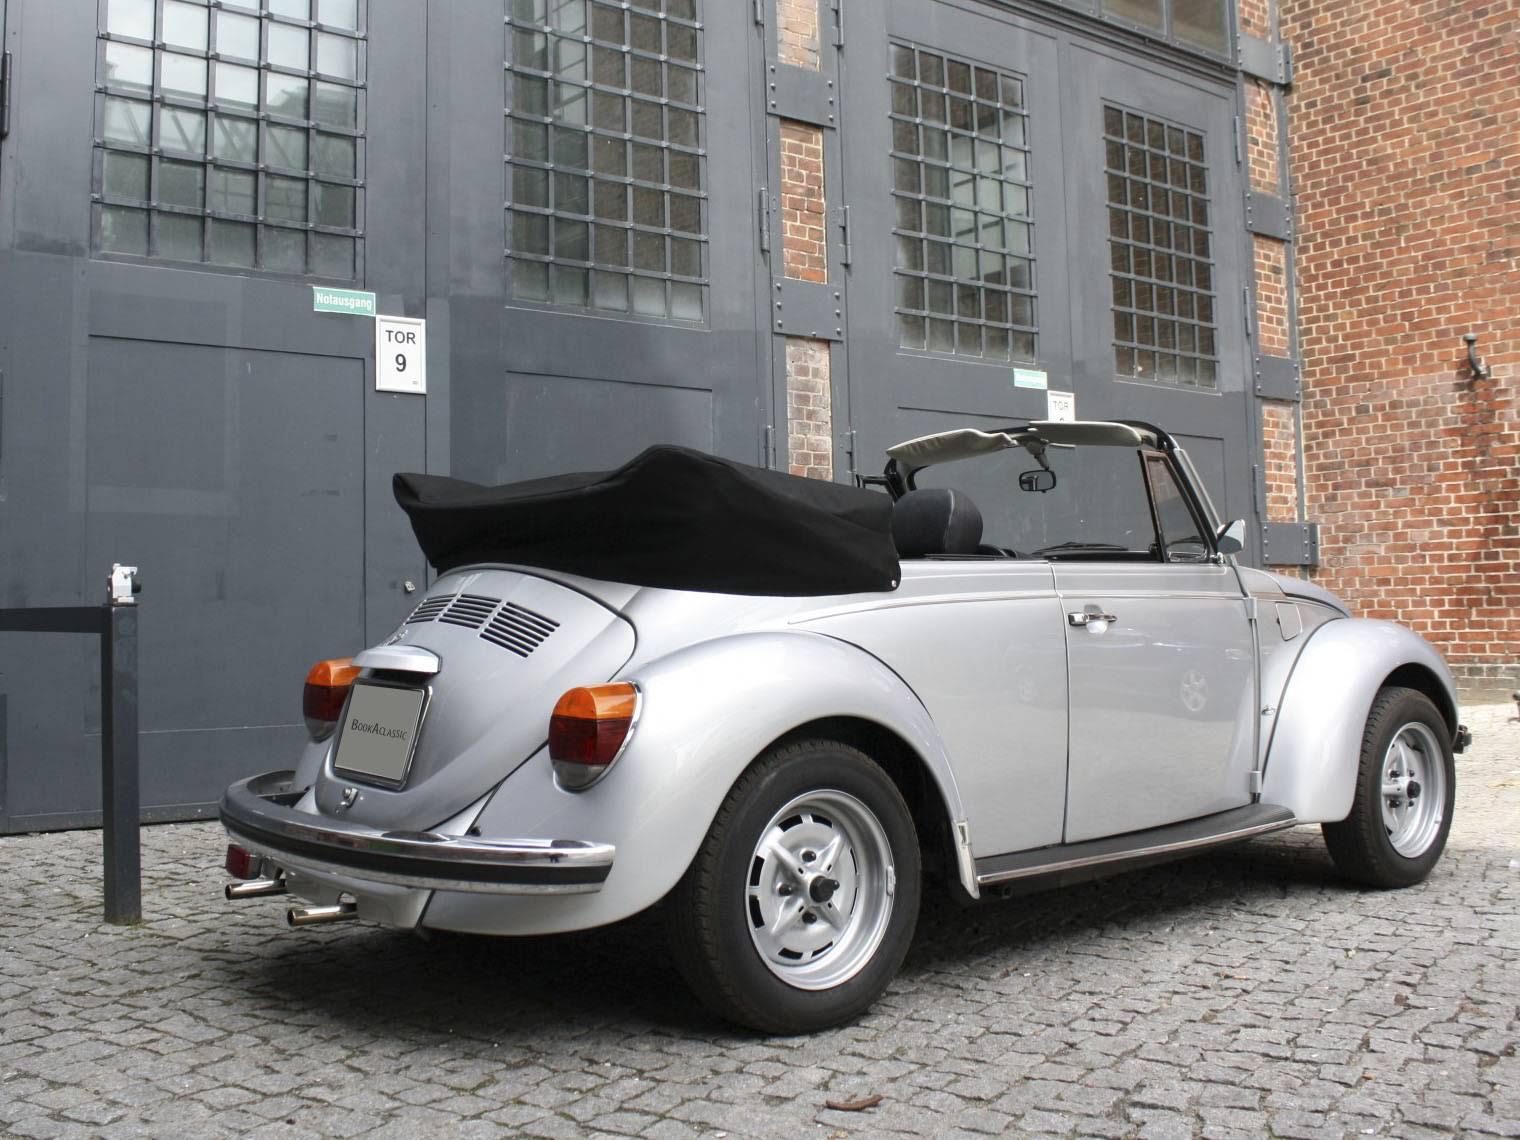 volkswagen k fer 1303 cabrio zu mieten in berlin. Black Bedroom Furniture Sets. Home Design Ideas